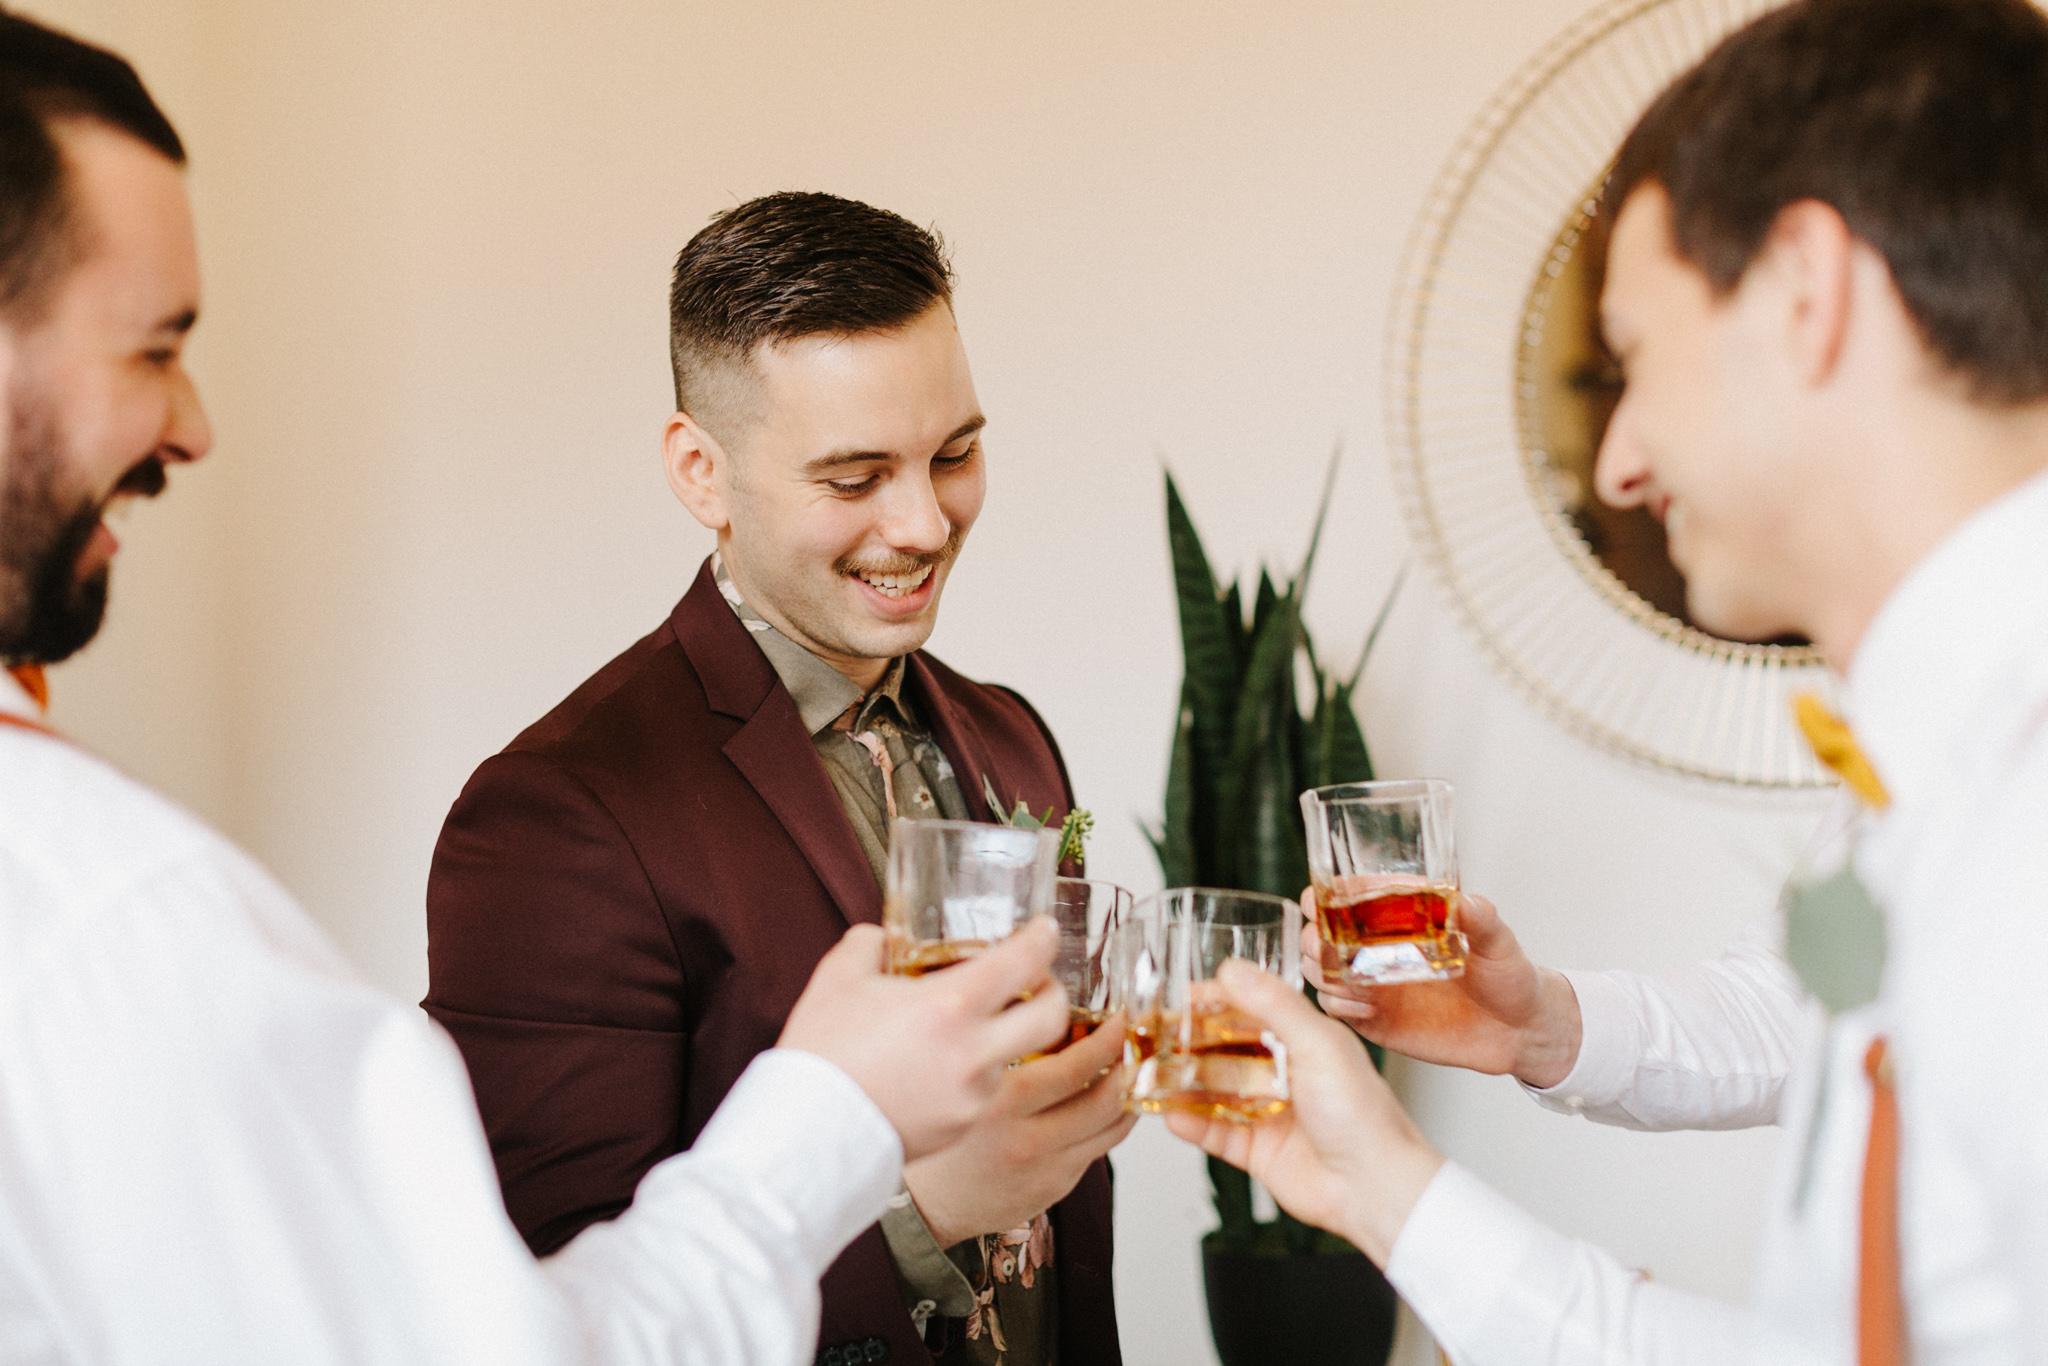 14_19-03-30 Caylen and Max Wedding Previews-29.jpg